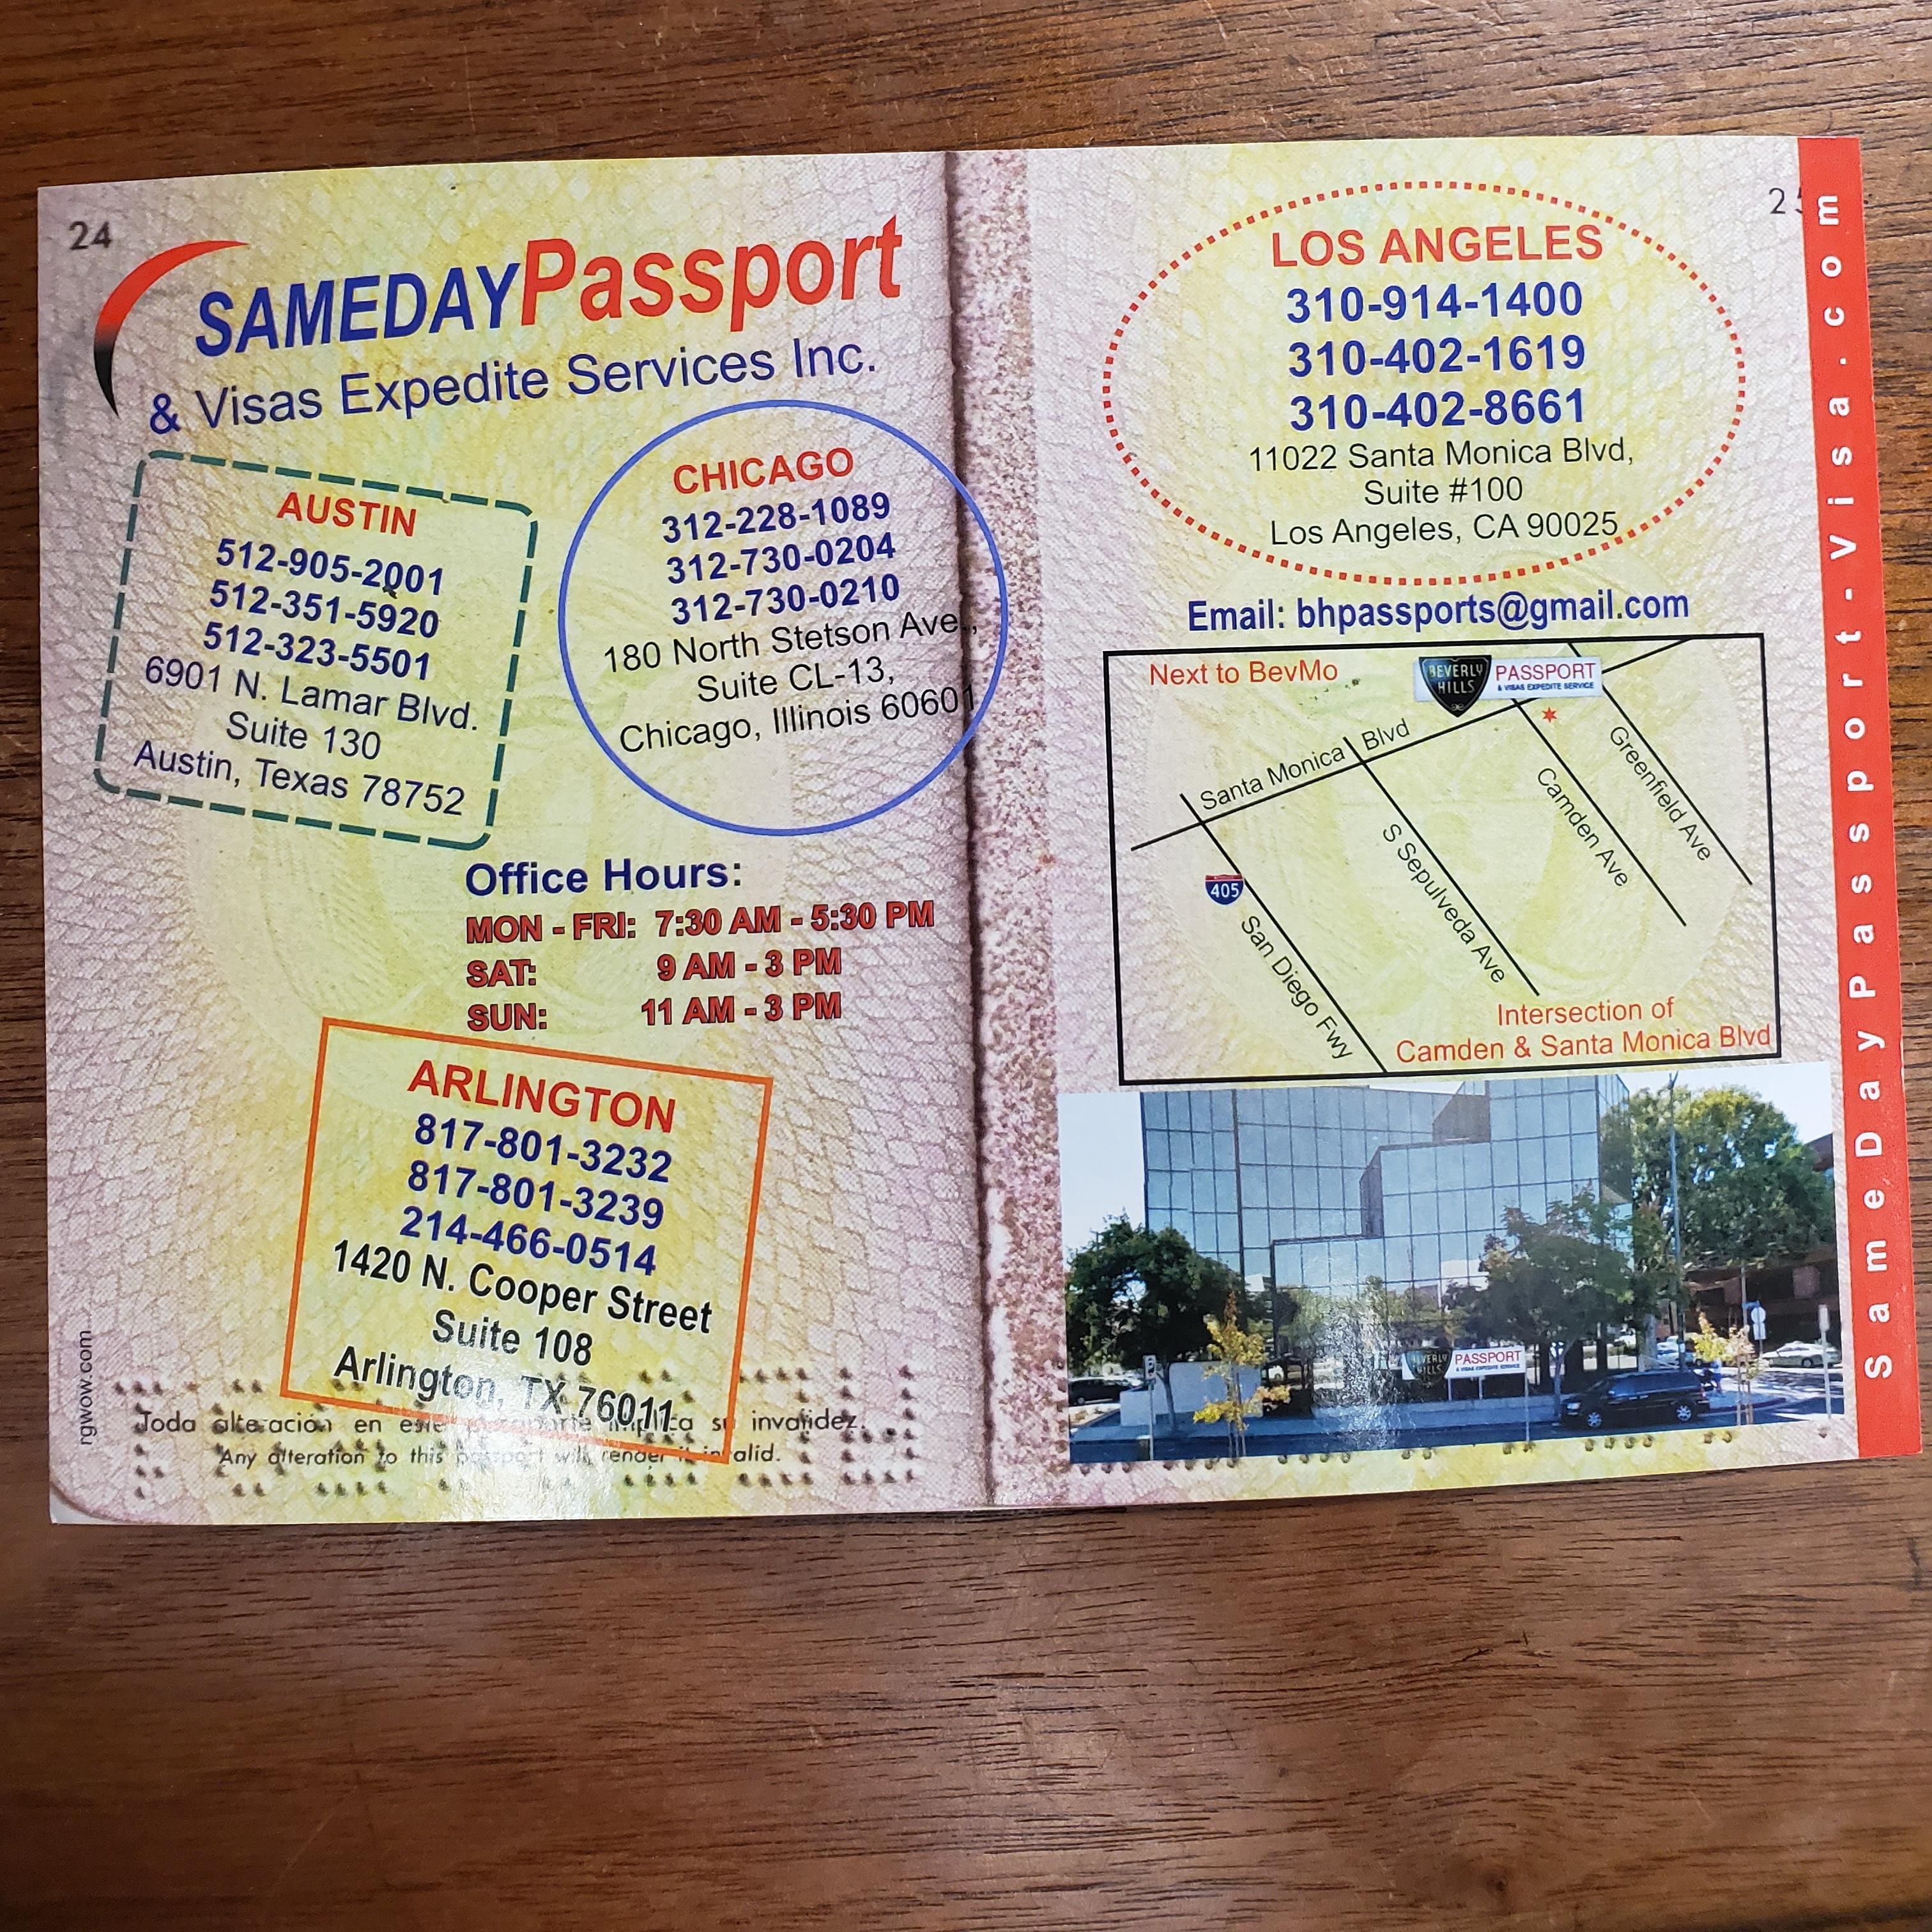 Sameday Passport Visa Expedite Services 1420 N Cooper St Ste 108 Arlington Tx 76011 Yp Com